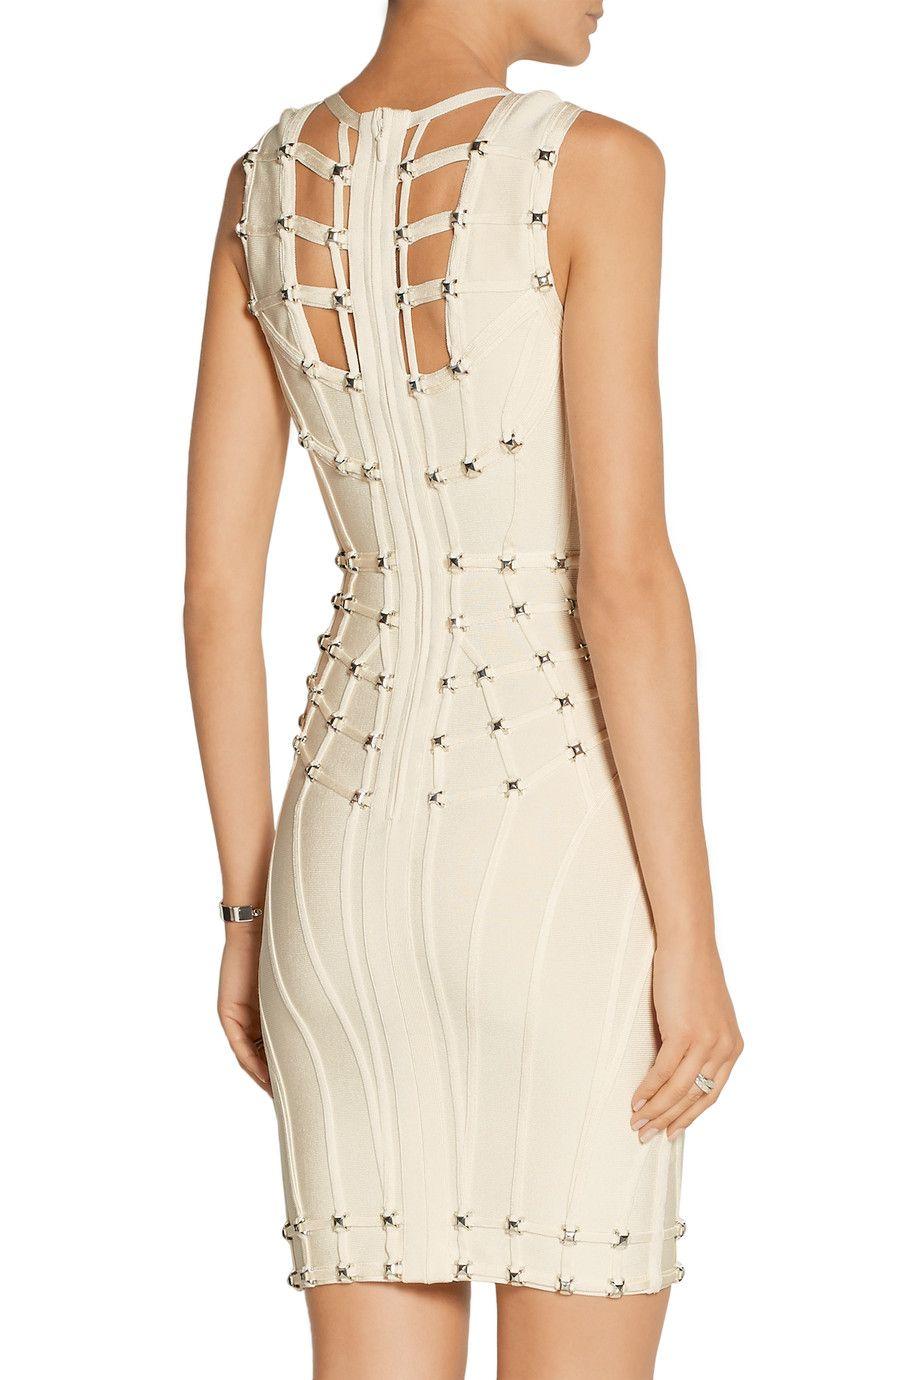 Cutout studded bandage mini dress hervé léger uk the outnet